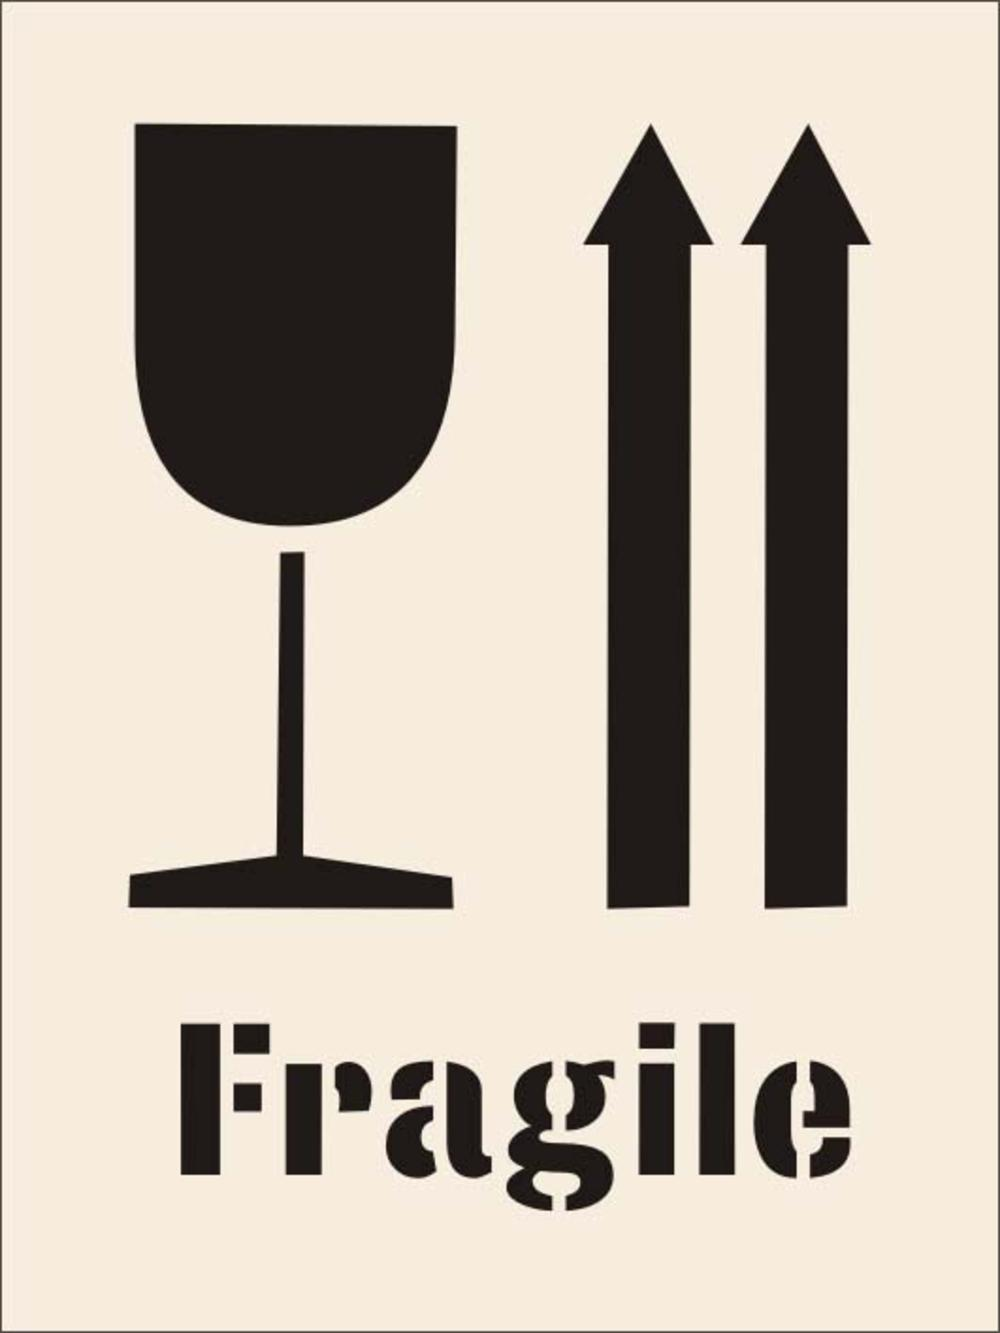 Fragile Arrows Amp Glass Stencil 190 X 300mm Fragile